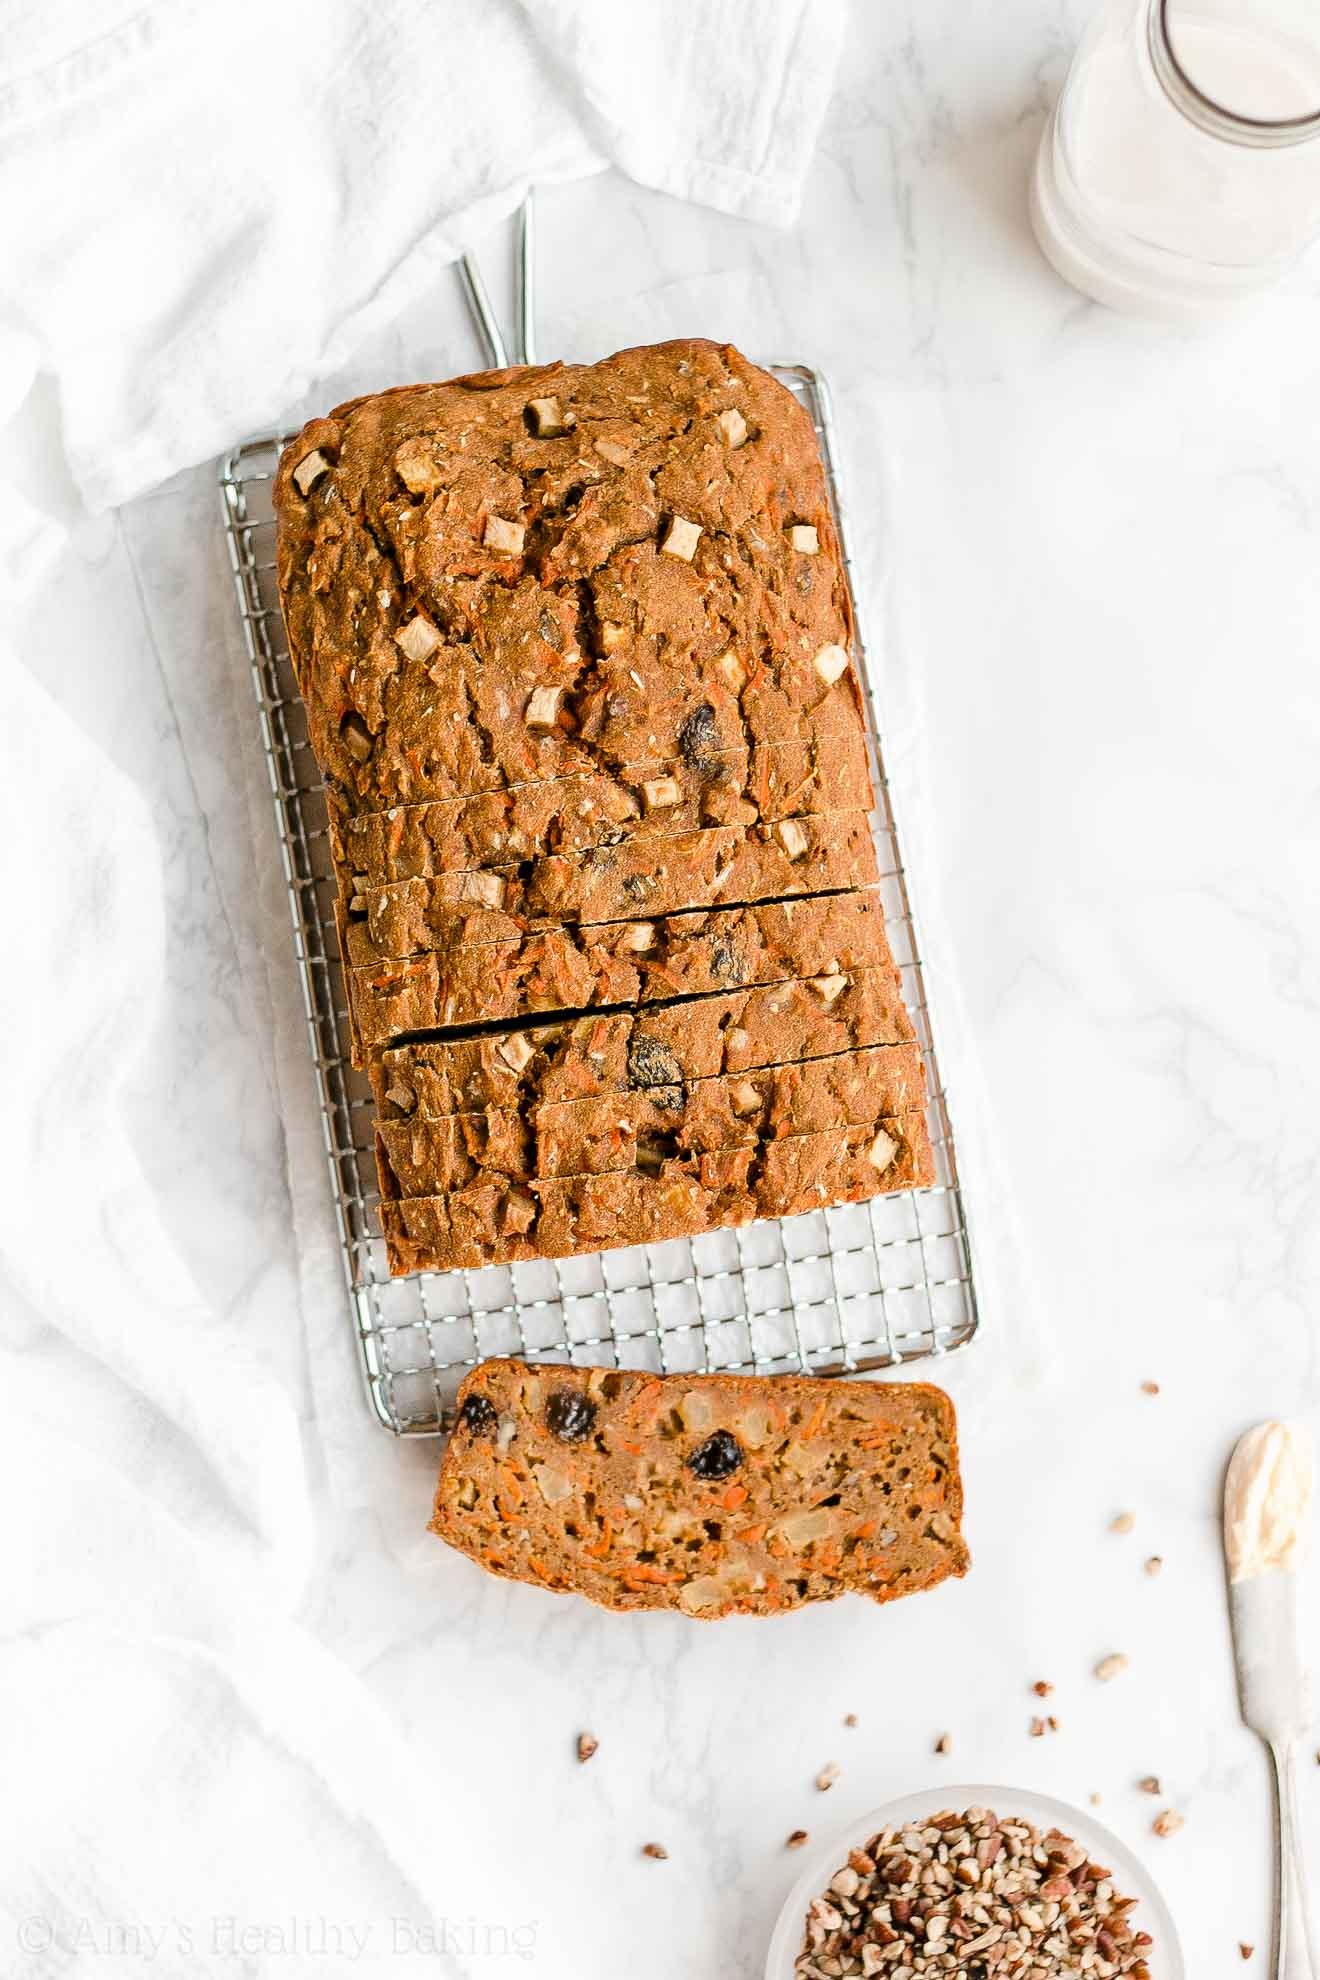 Easy Healthy Gluten Free Low Sugar Morning Glory Pumpkin Bread